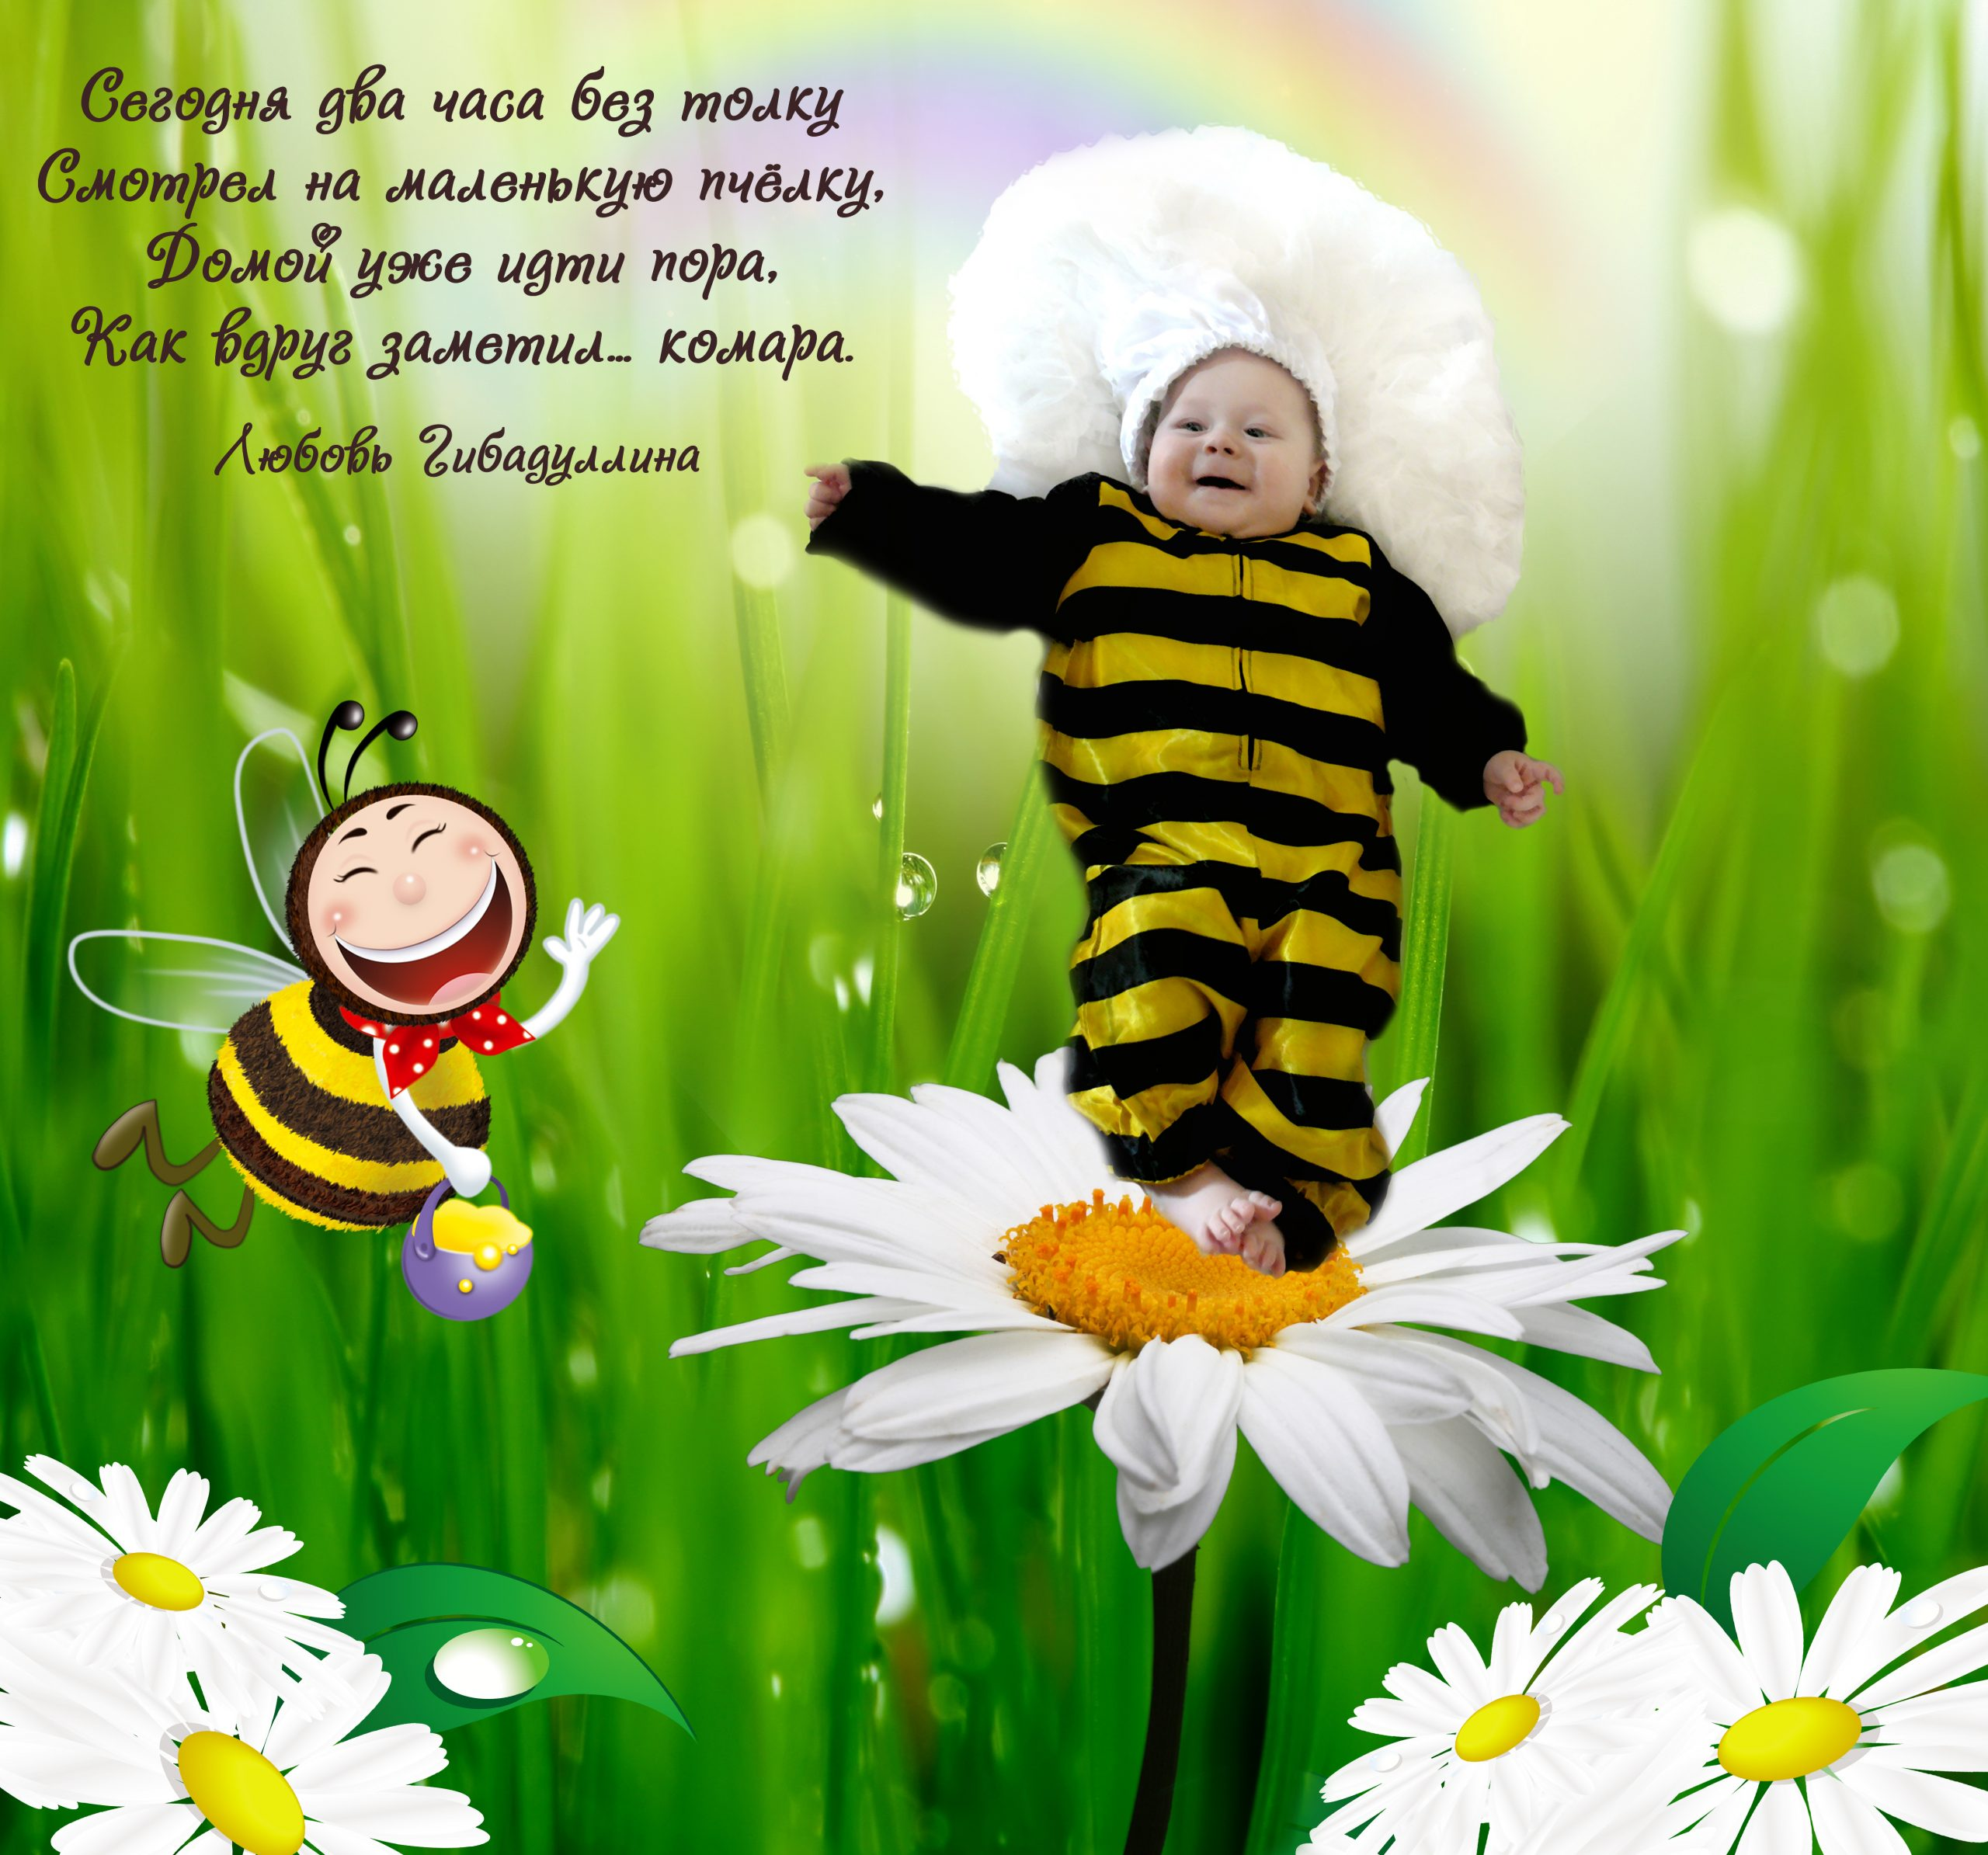 Детские стихи про Марину